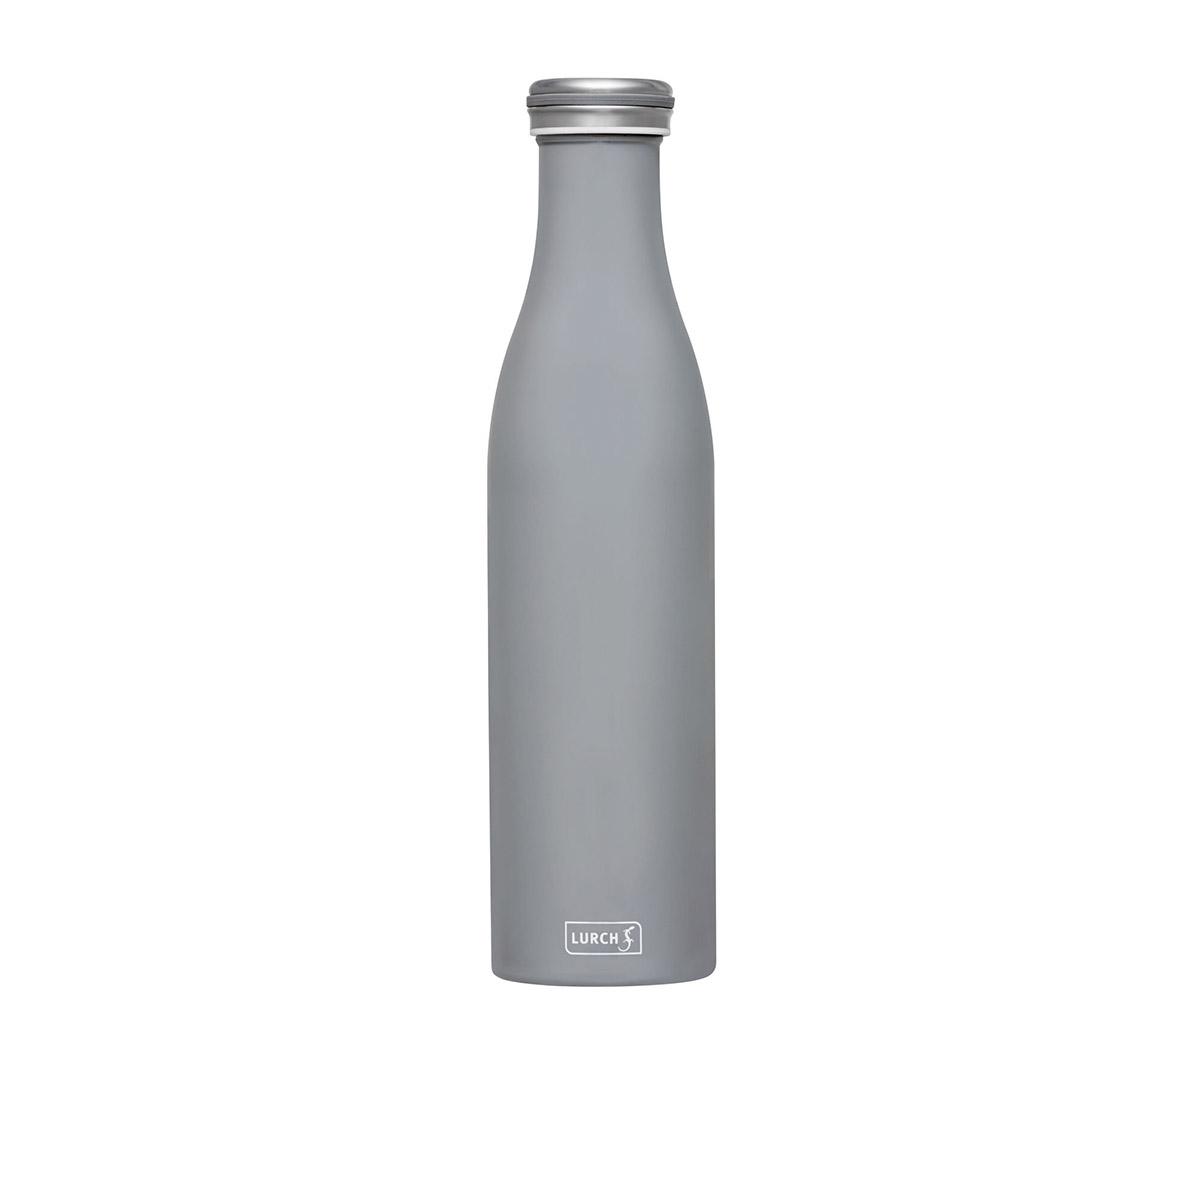 butelka termiczna, stalowa, 0,75 l, jasnoszara